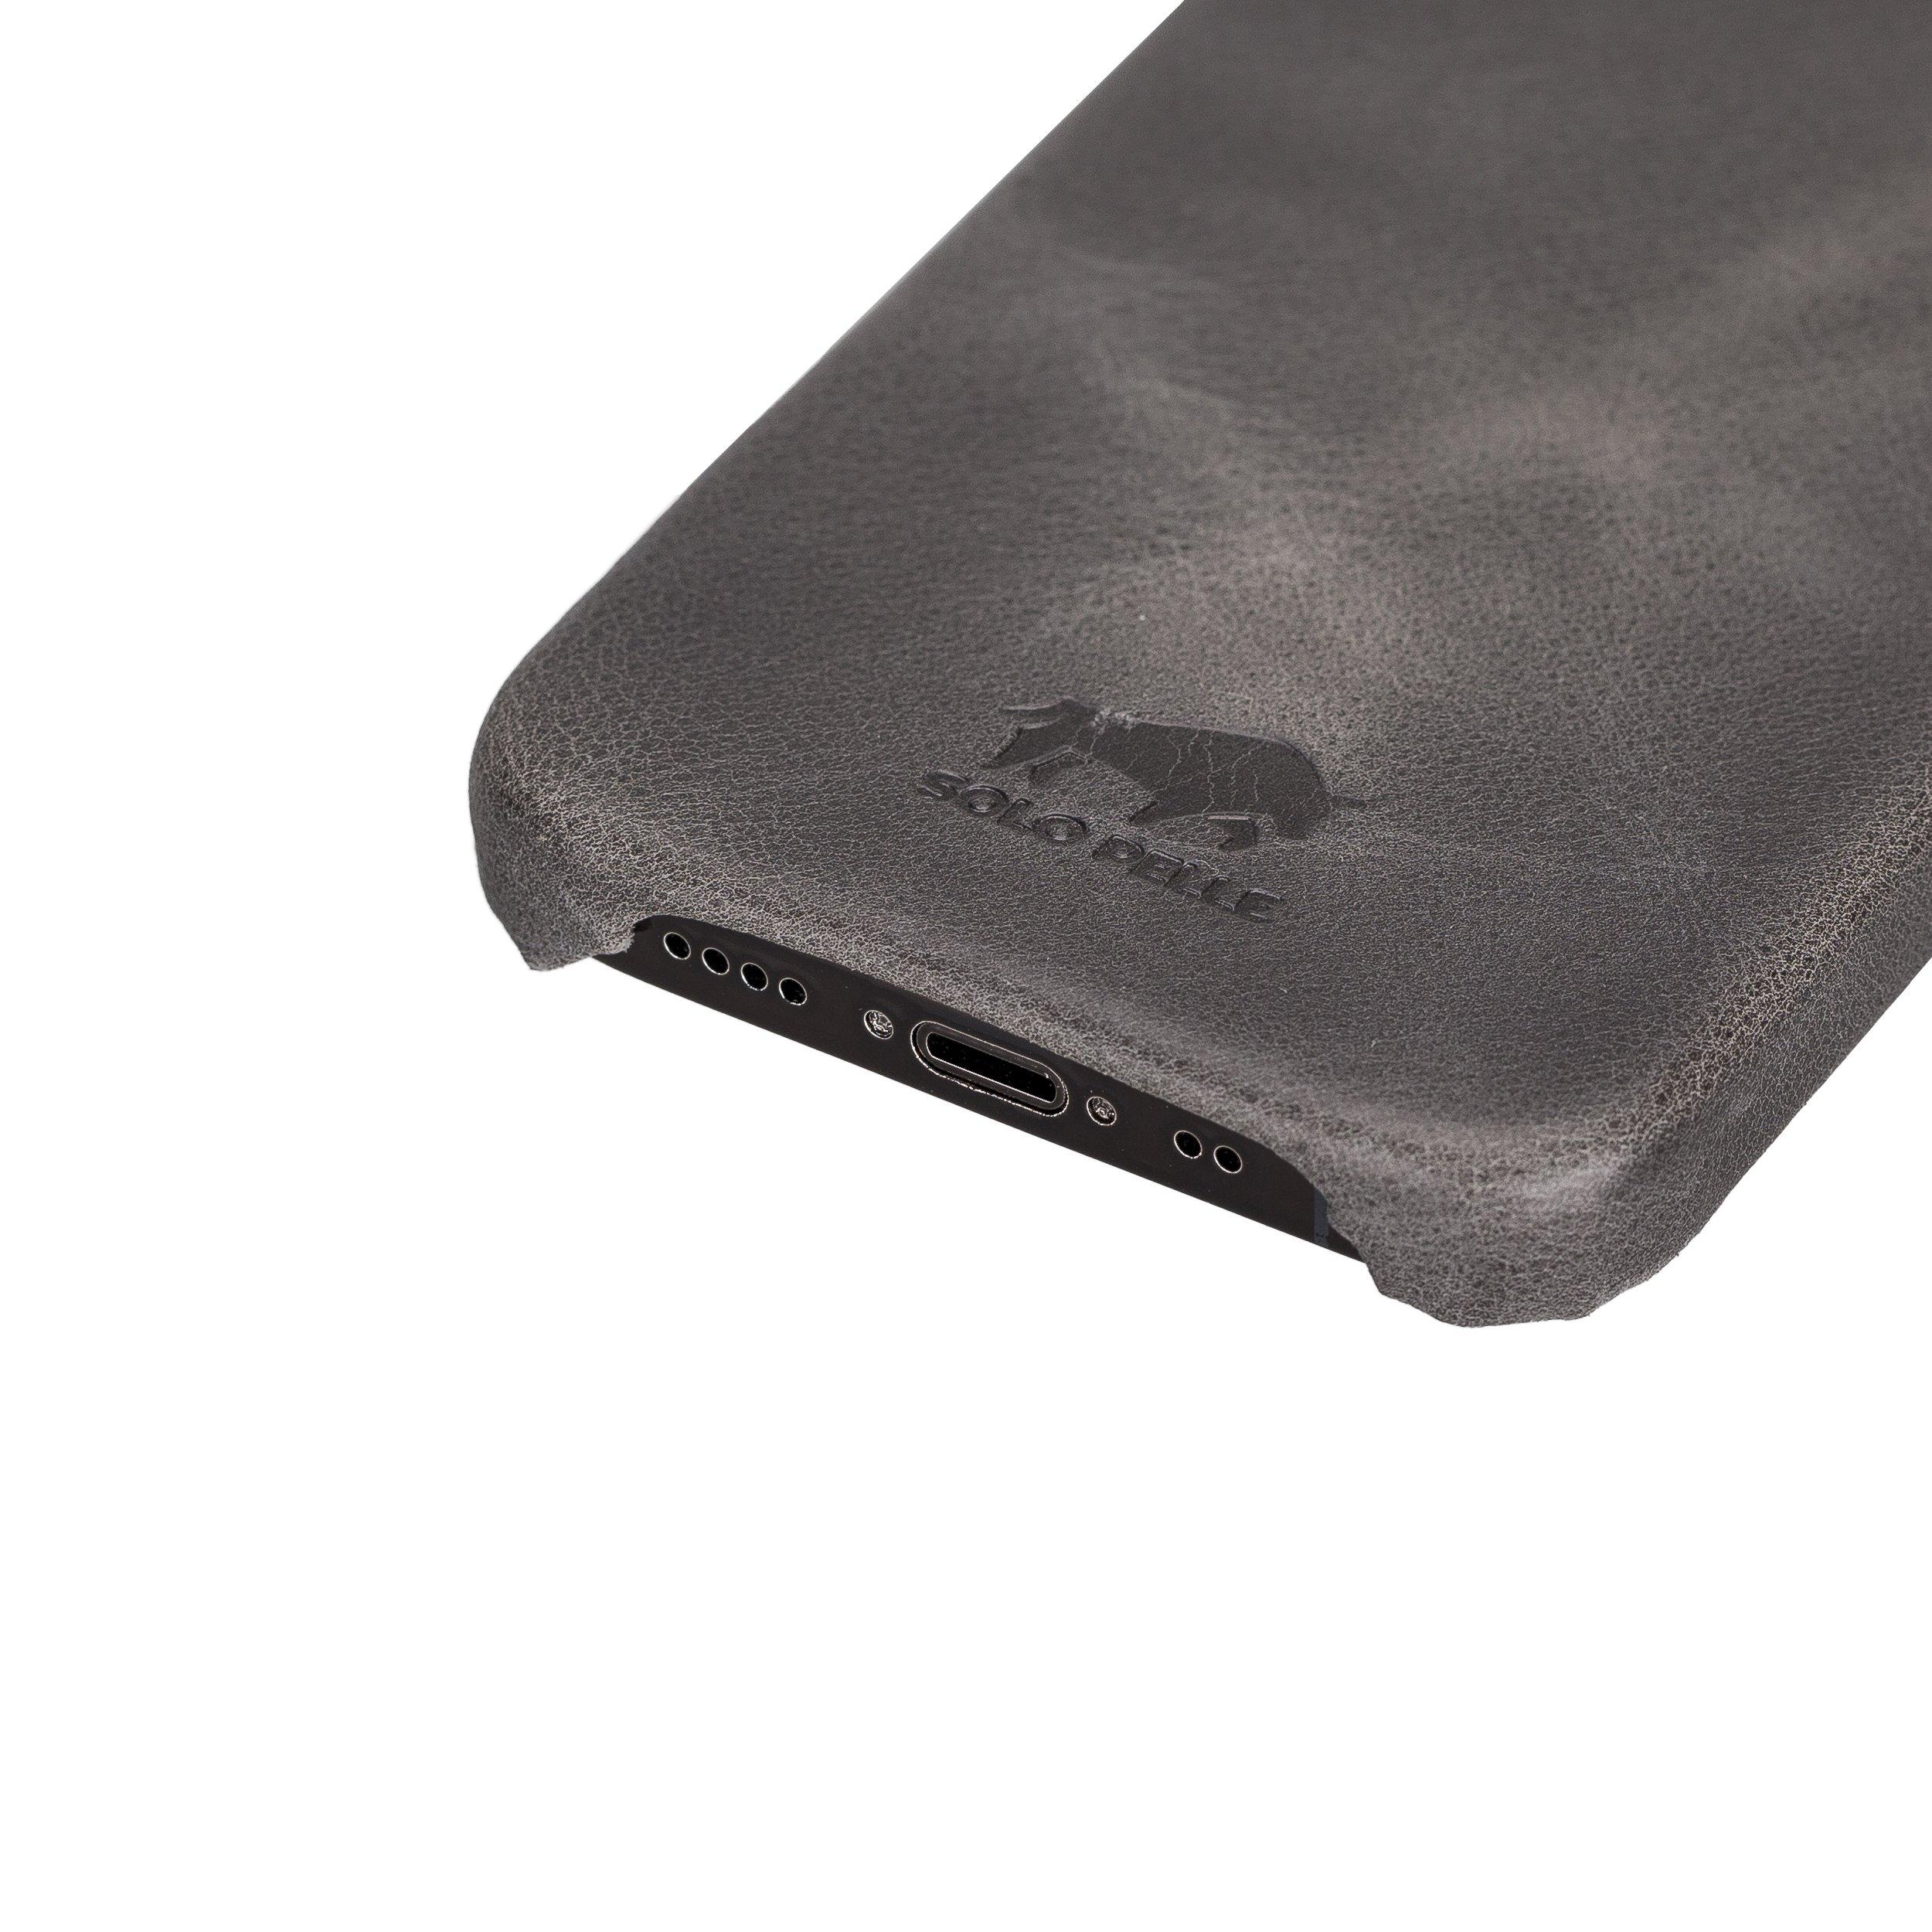 Solo Pelle Lederhülle für das Apple iPhone 12 Mini in 5.4 Zoll Princeton Case Leder Hülle Ledertasche Backcover aus echtem Leder (Rot Effekt)